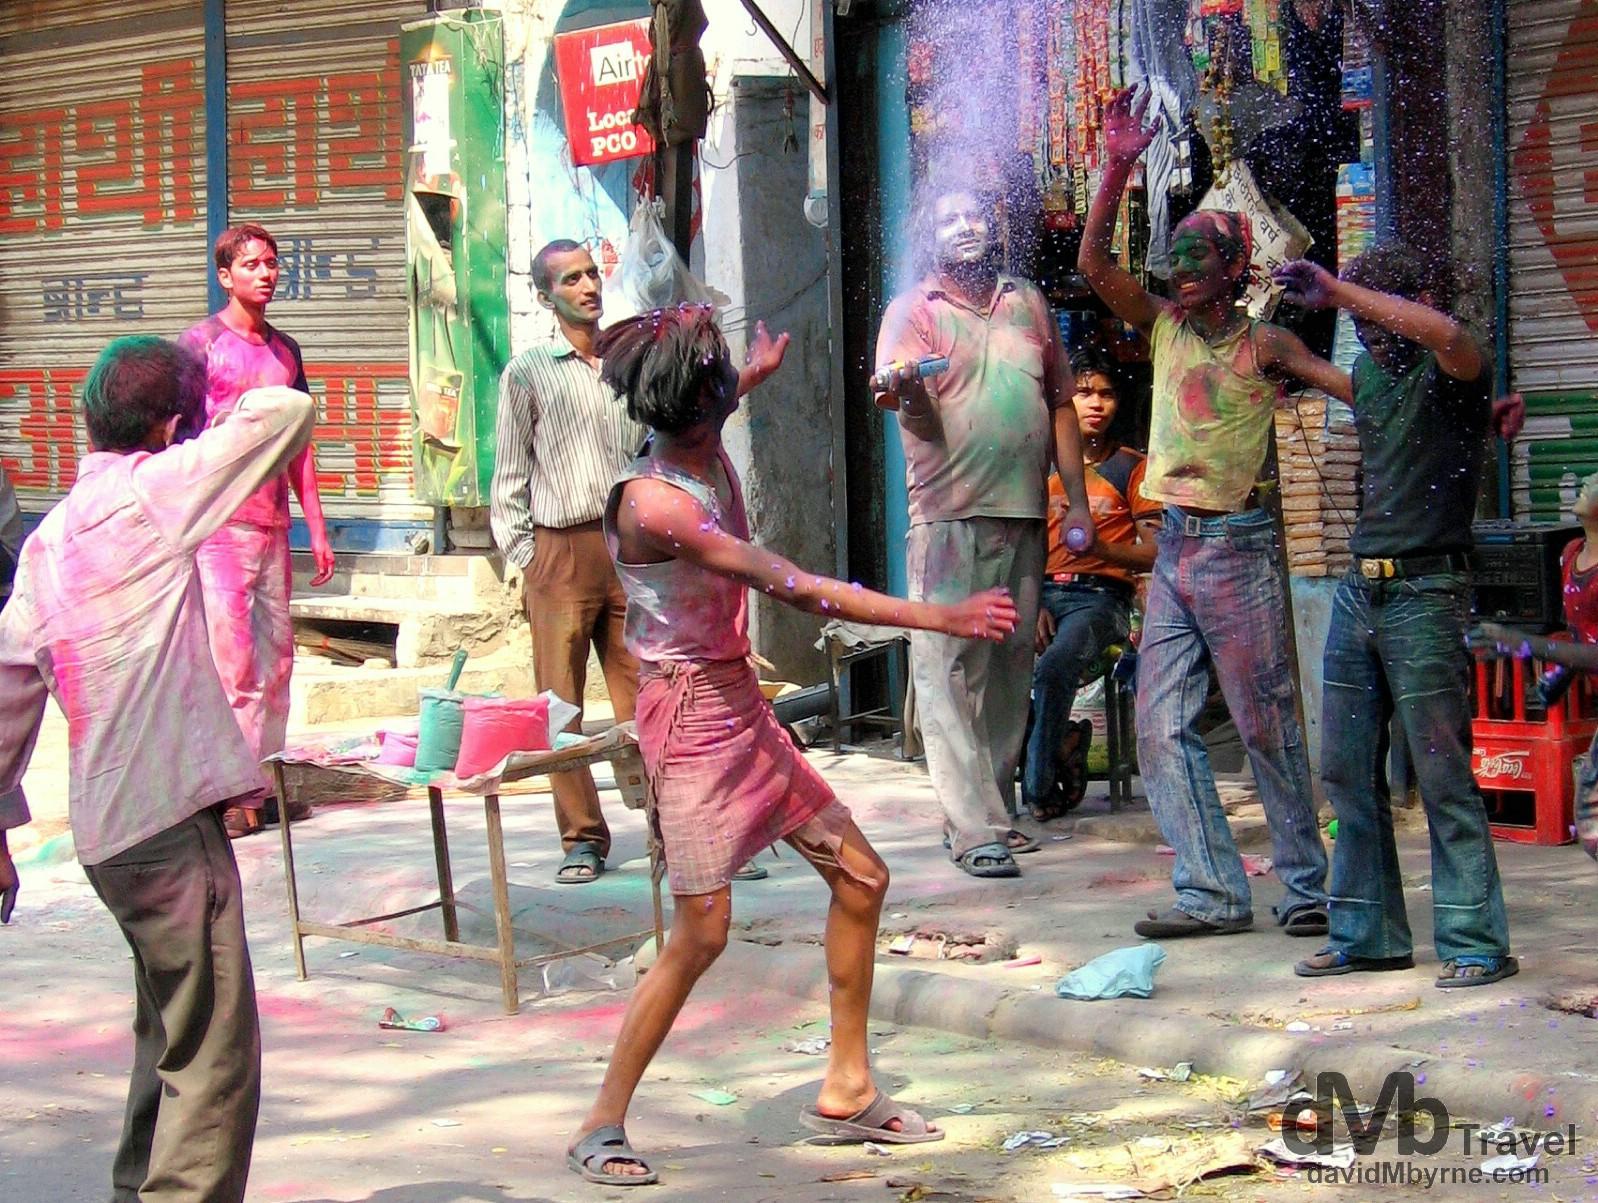 Indians enjoying the Hindu Colour Festival on the Main Bazaar of Paharganj. Delhi, India. March 22, 2008.